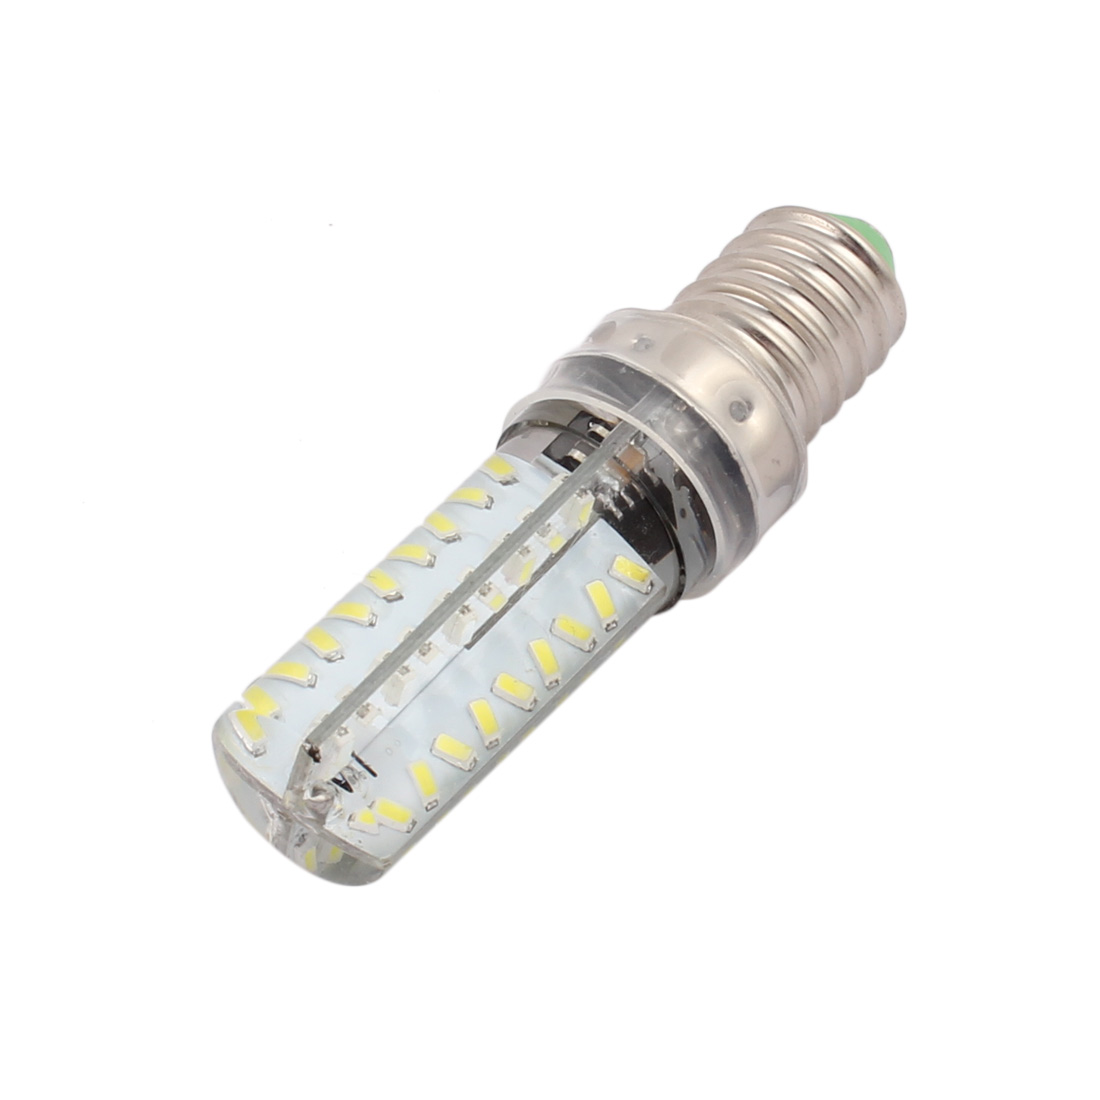 AC 220V 4W E14 3014SMD LED Corn Light Bulb 72-LED Lamp Dimmable Neutral White